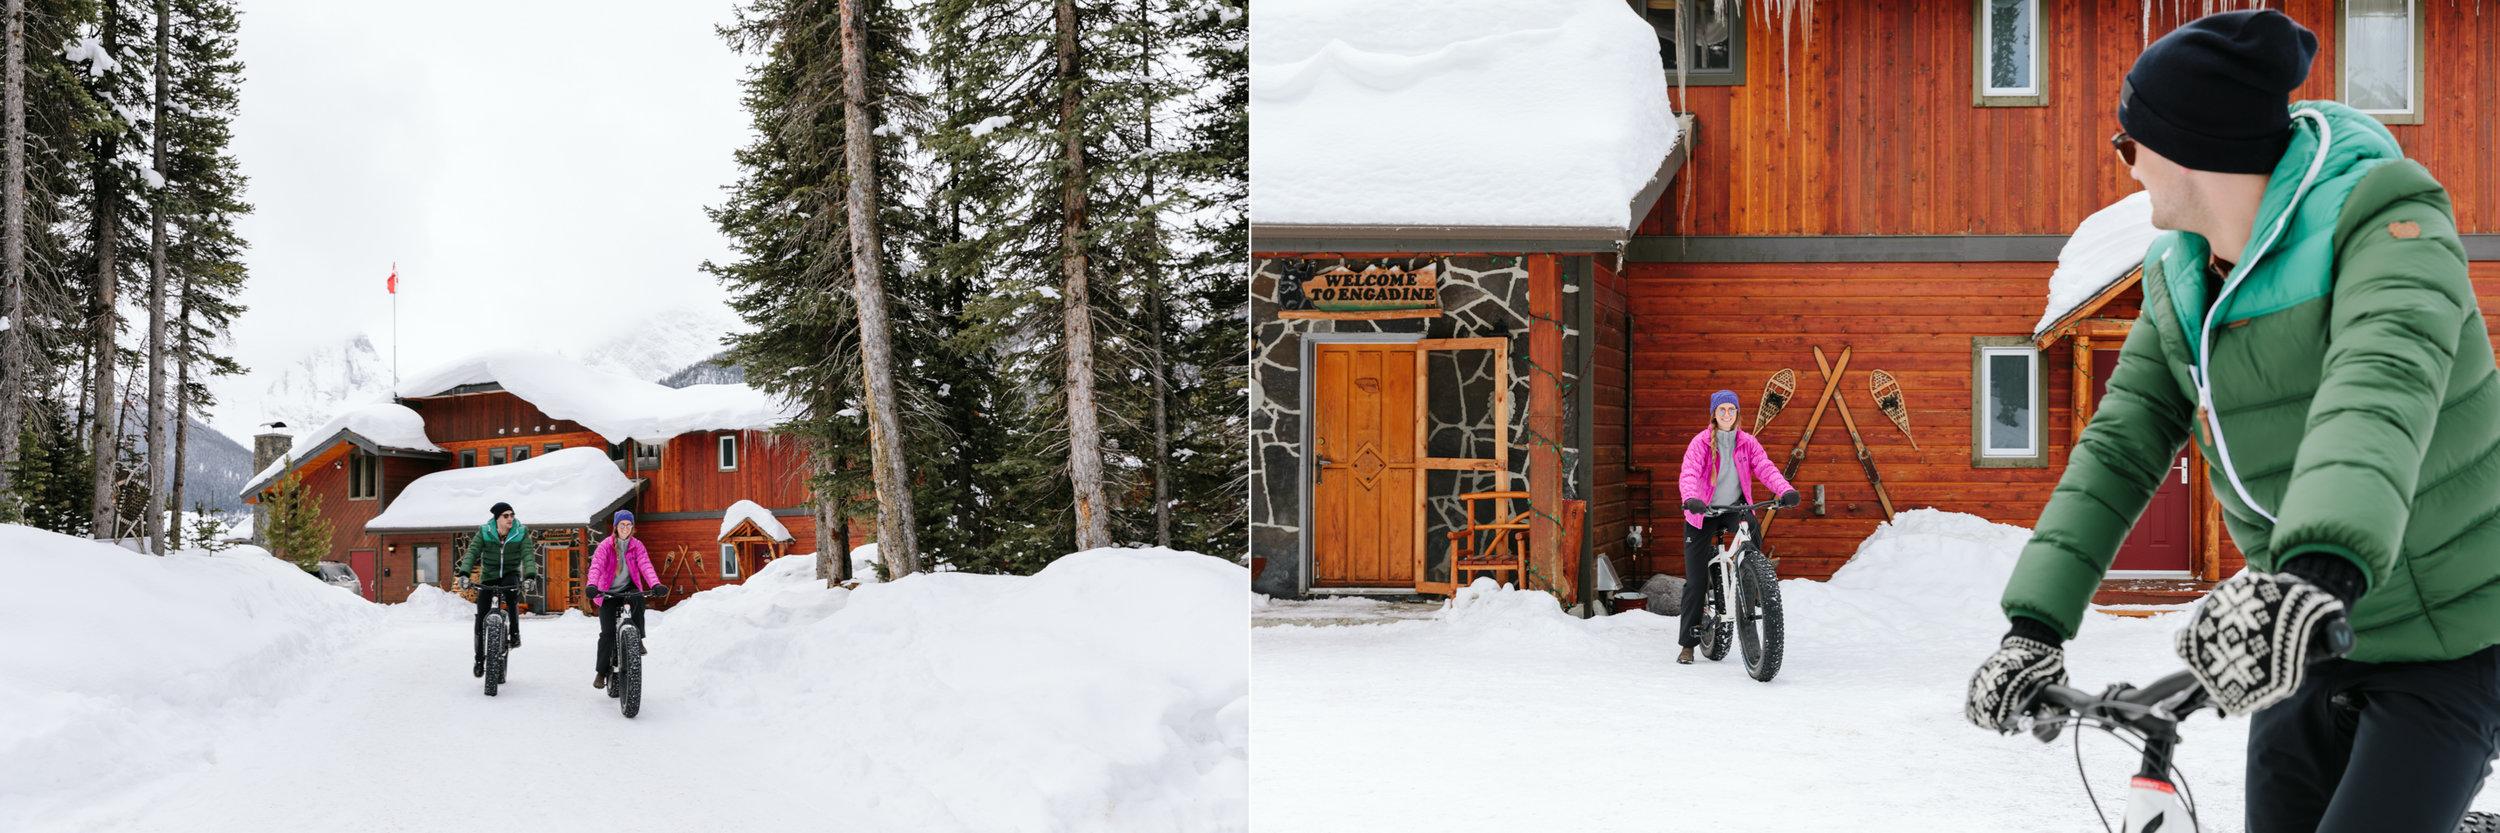 MikeSeehagel_TravelAlberta_NordicSpa_LifestylePhotographer_w7.jpg